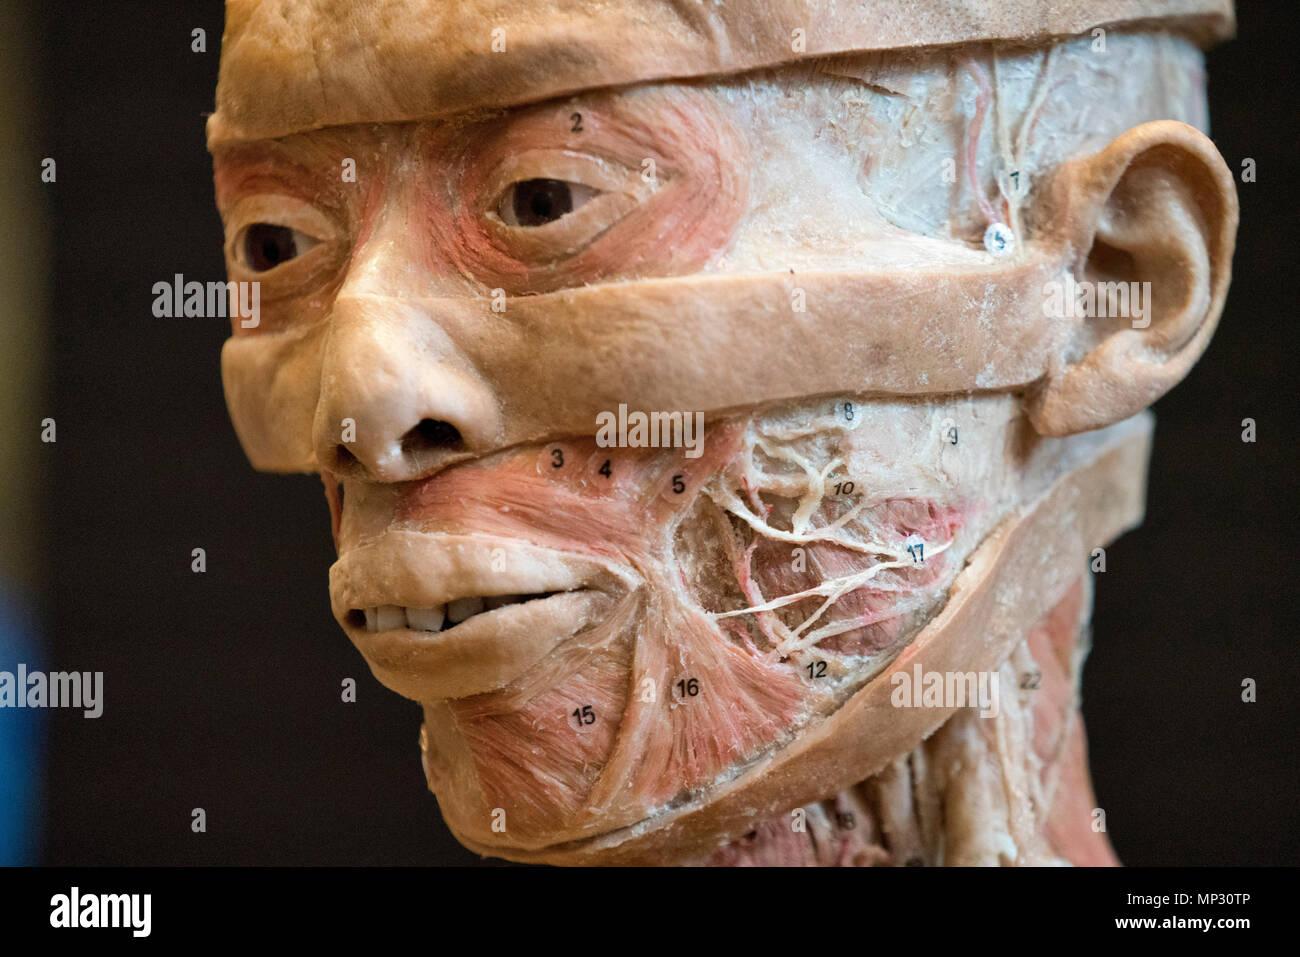 Anatomy Of A Real Human Head Stock Photo 185692662 Alamy